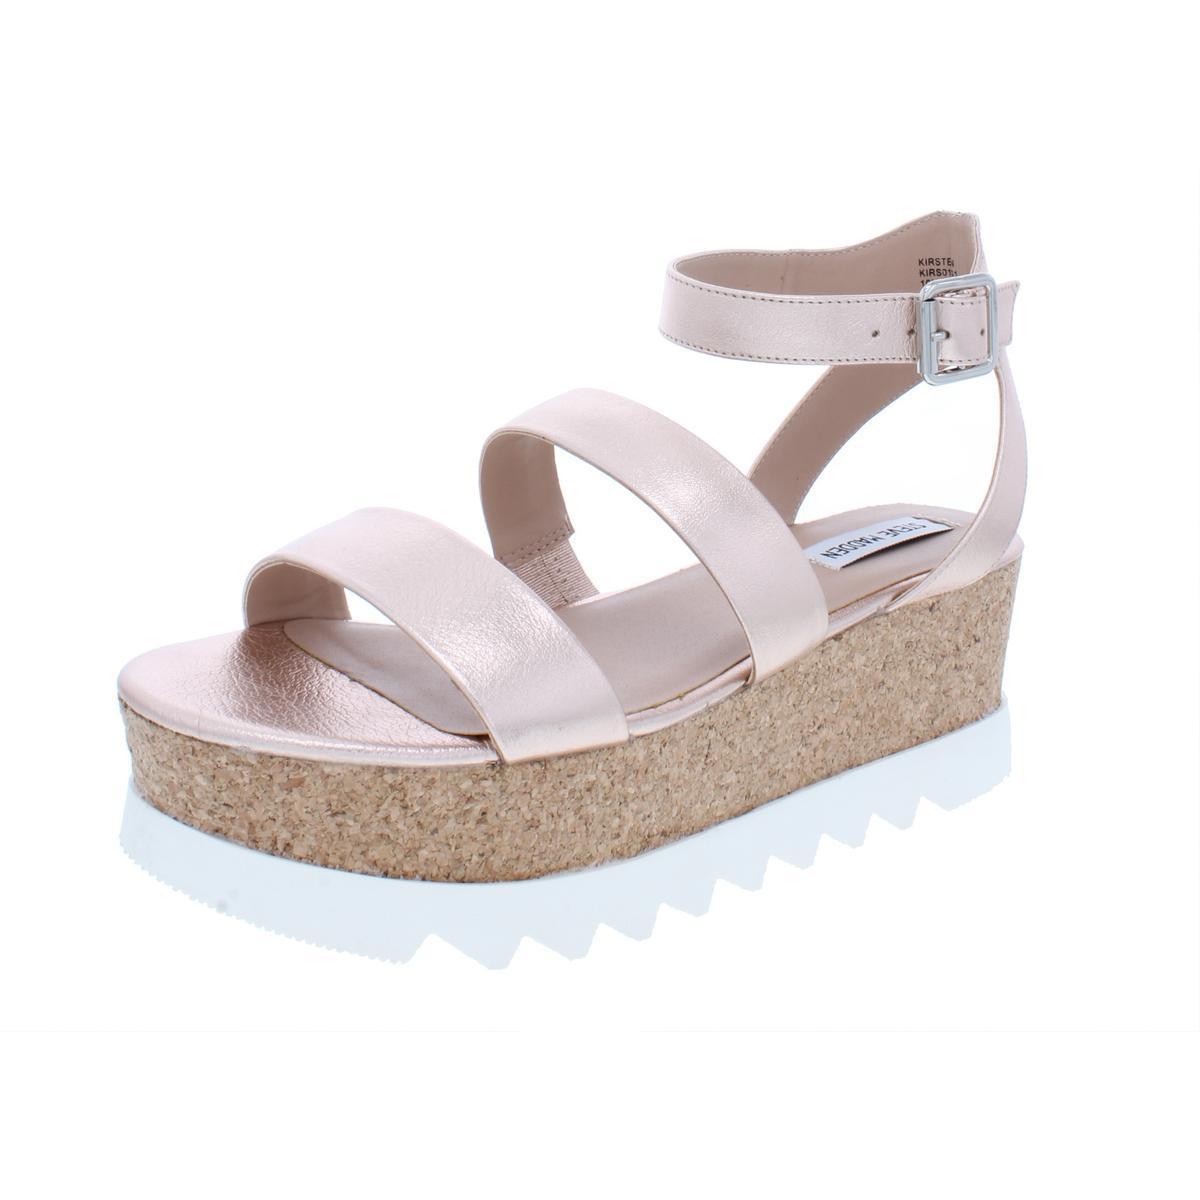 ac7088847095 Details about Steve Madden Womens Kirsten Metallic Platform Sandals 7  Medium (B